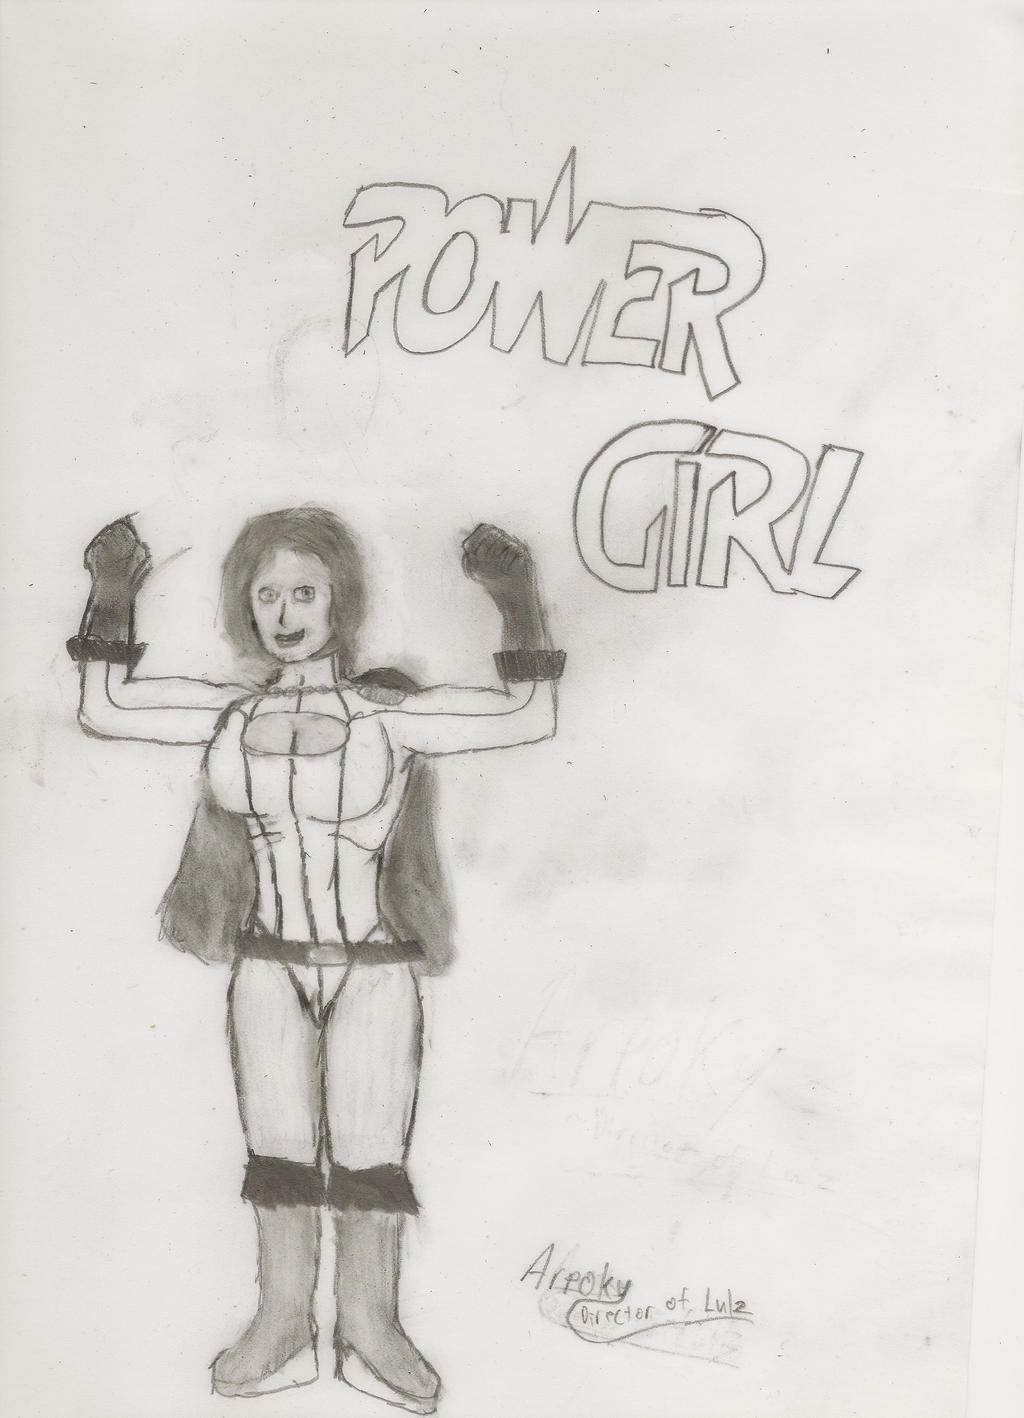 Power Girl by Arpoky by Arpoky